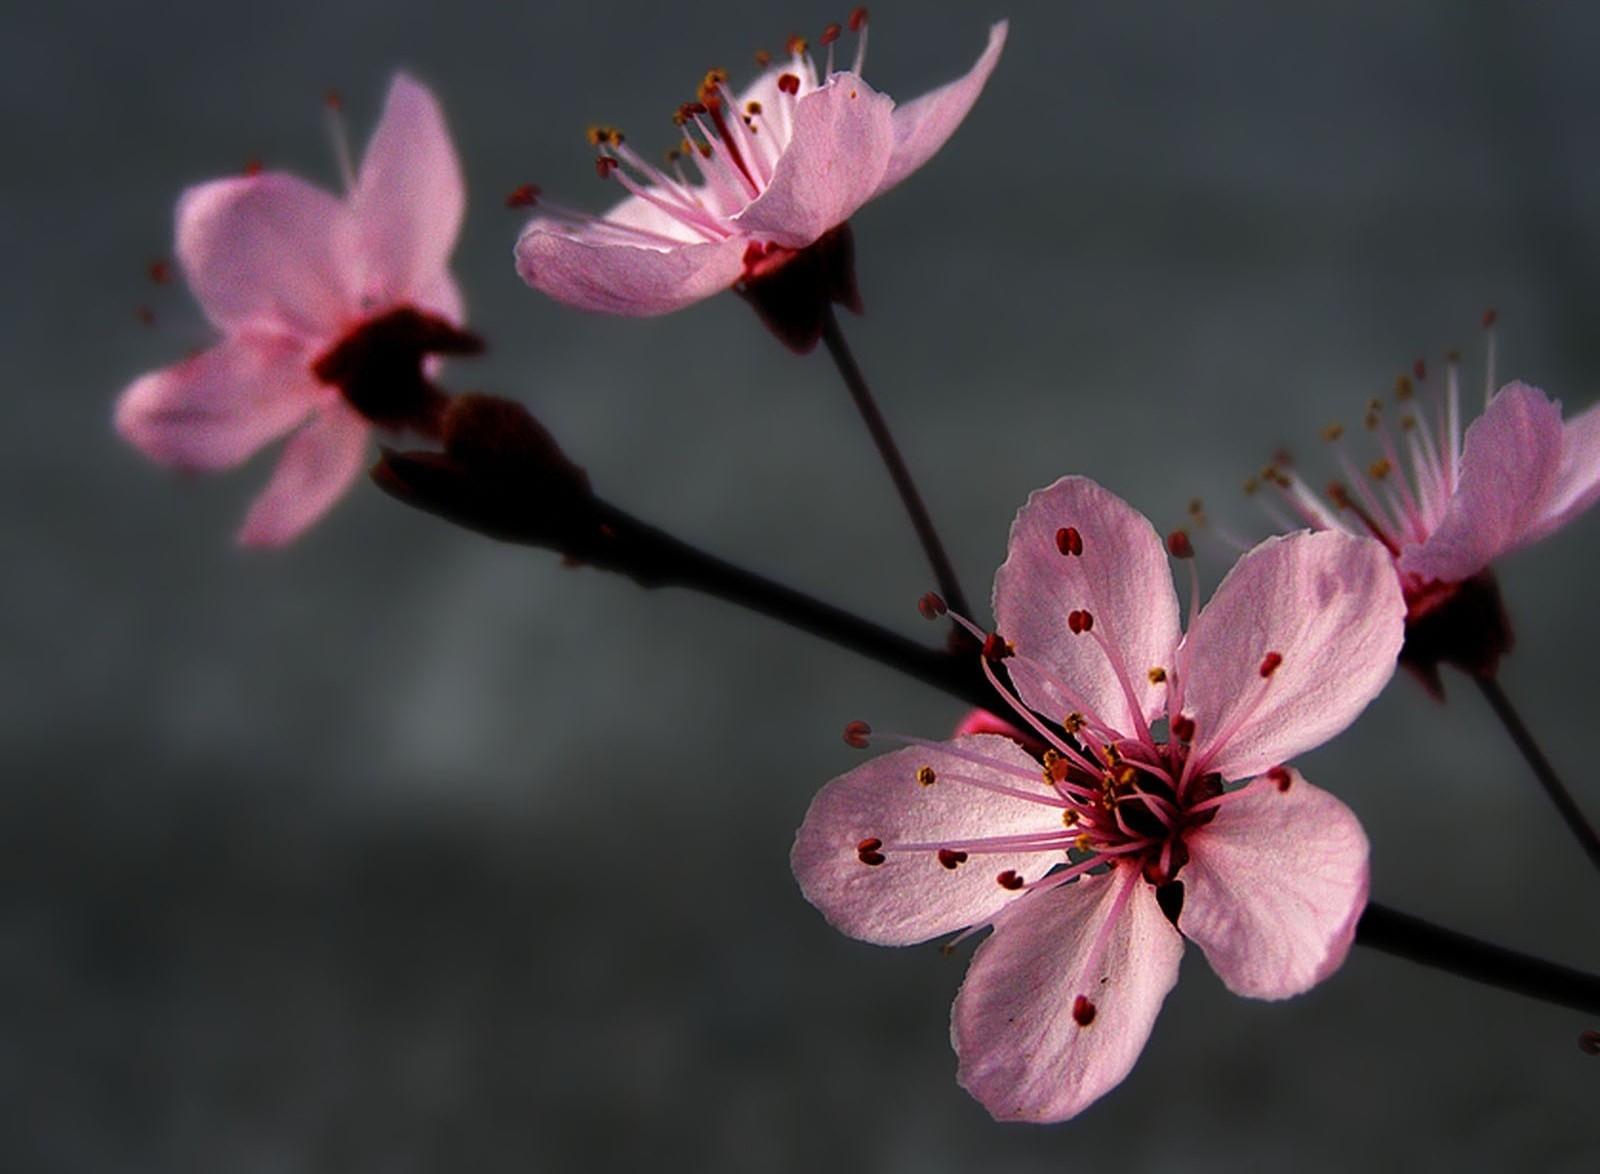 blossom branch spring pollen close up 723503